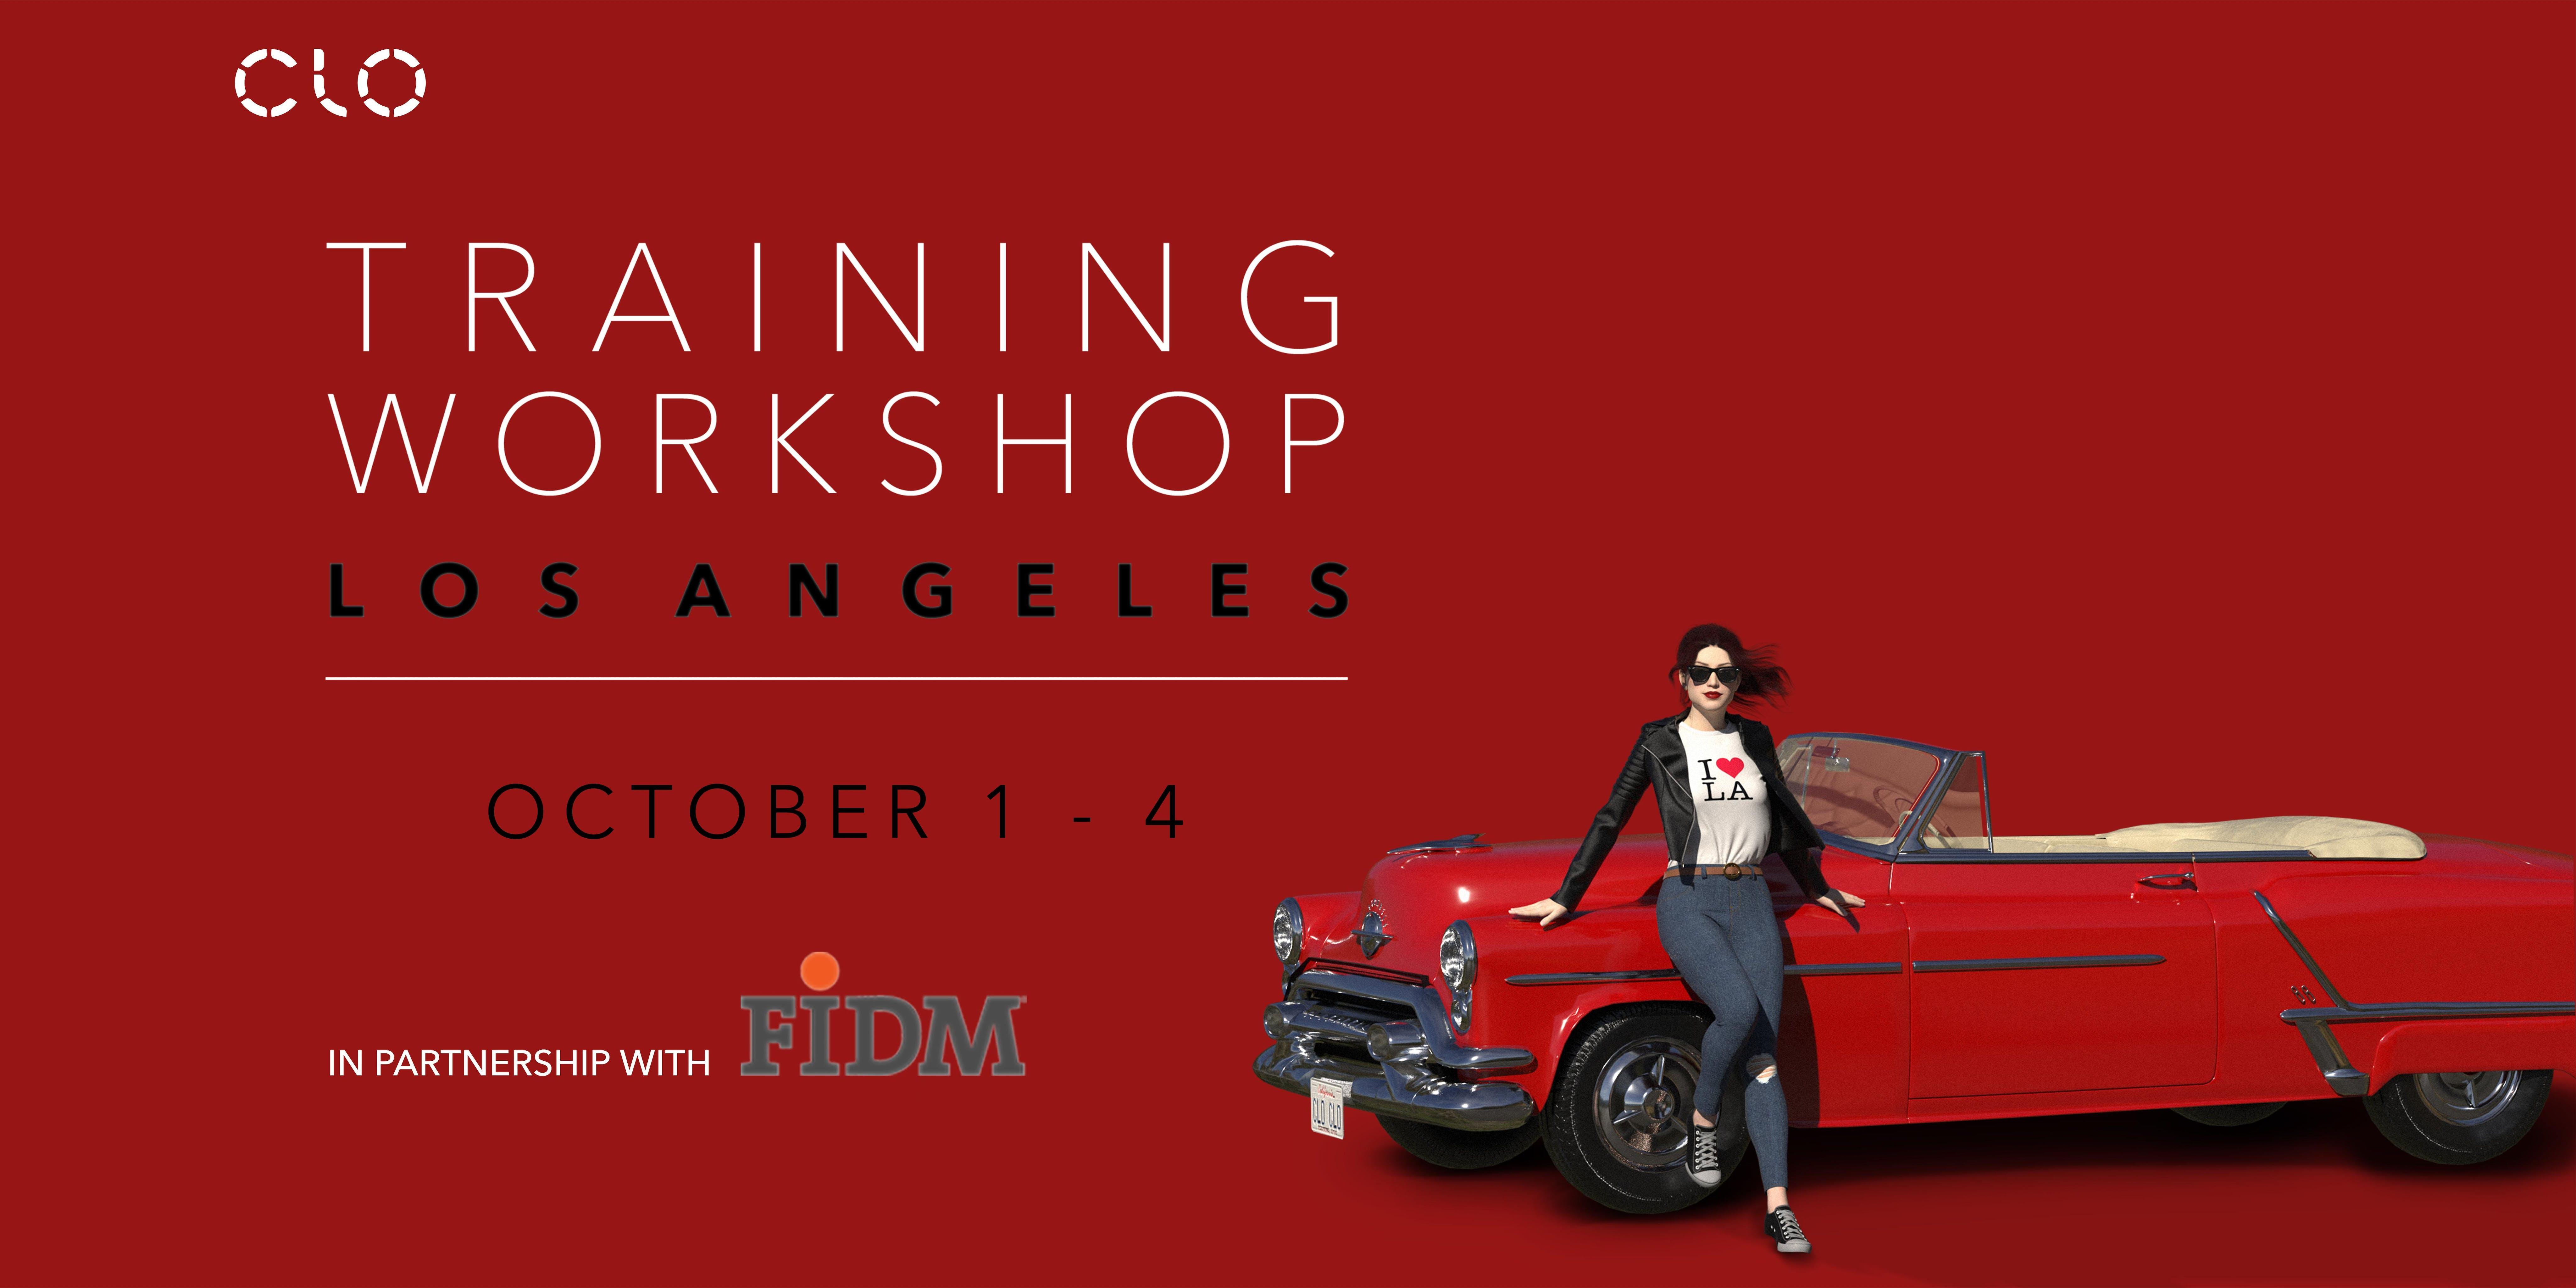 Clo Virtual Fashion Training Workshop La 1 Oct 2019